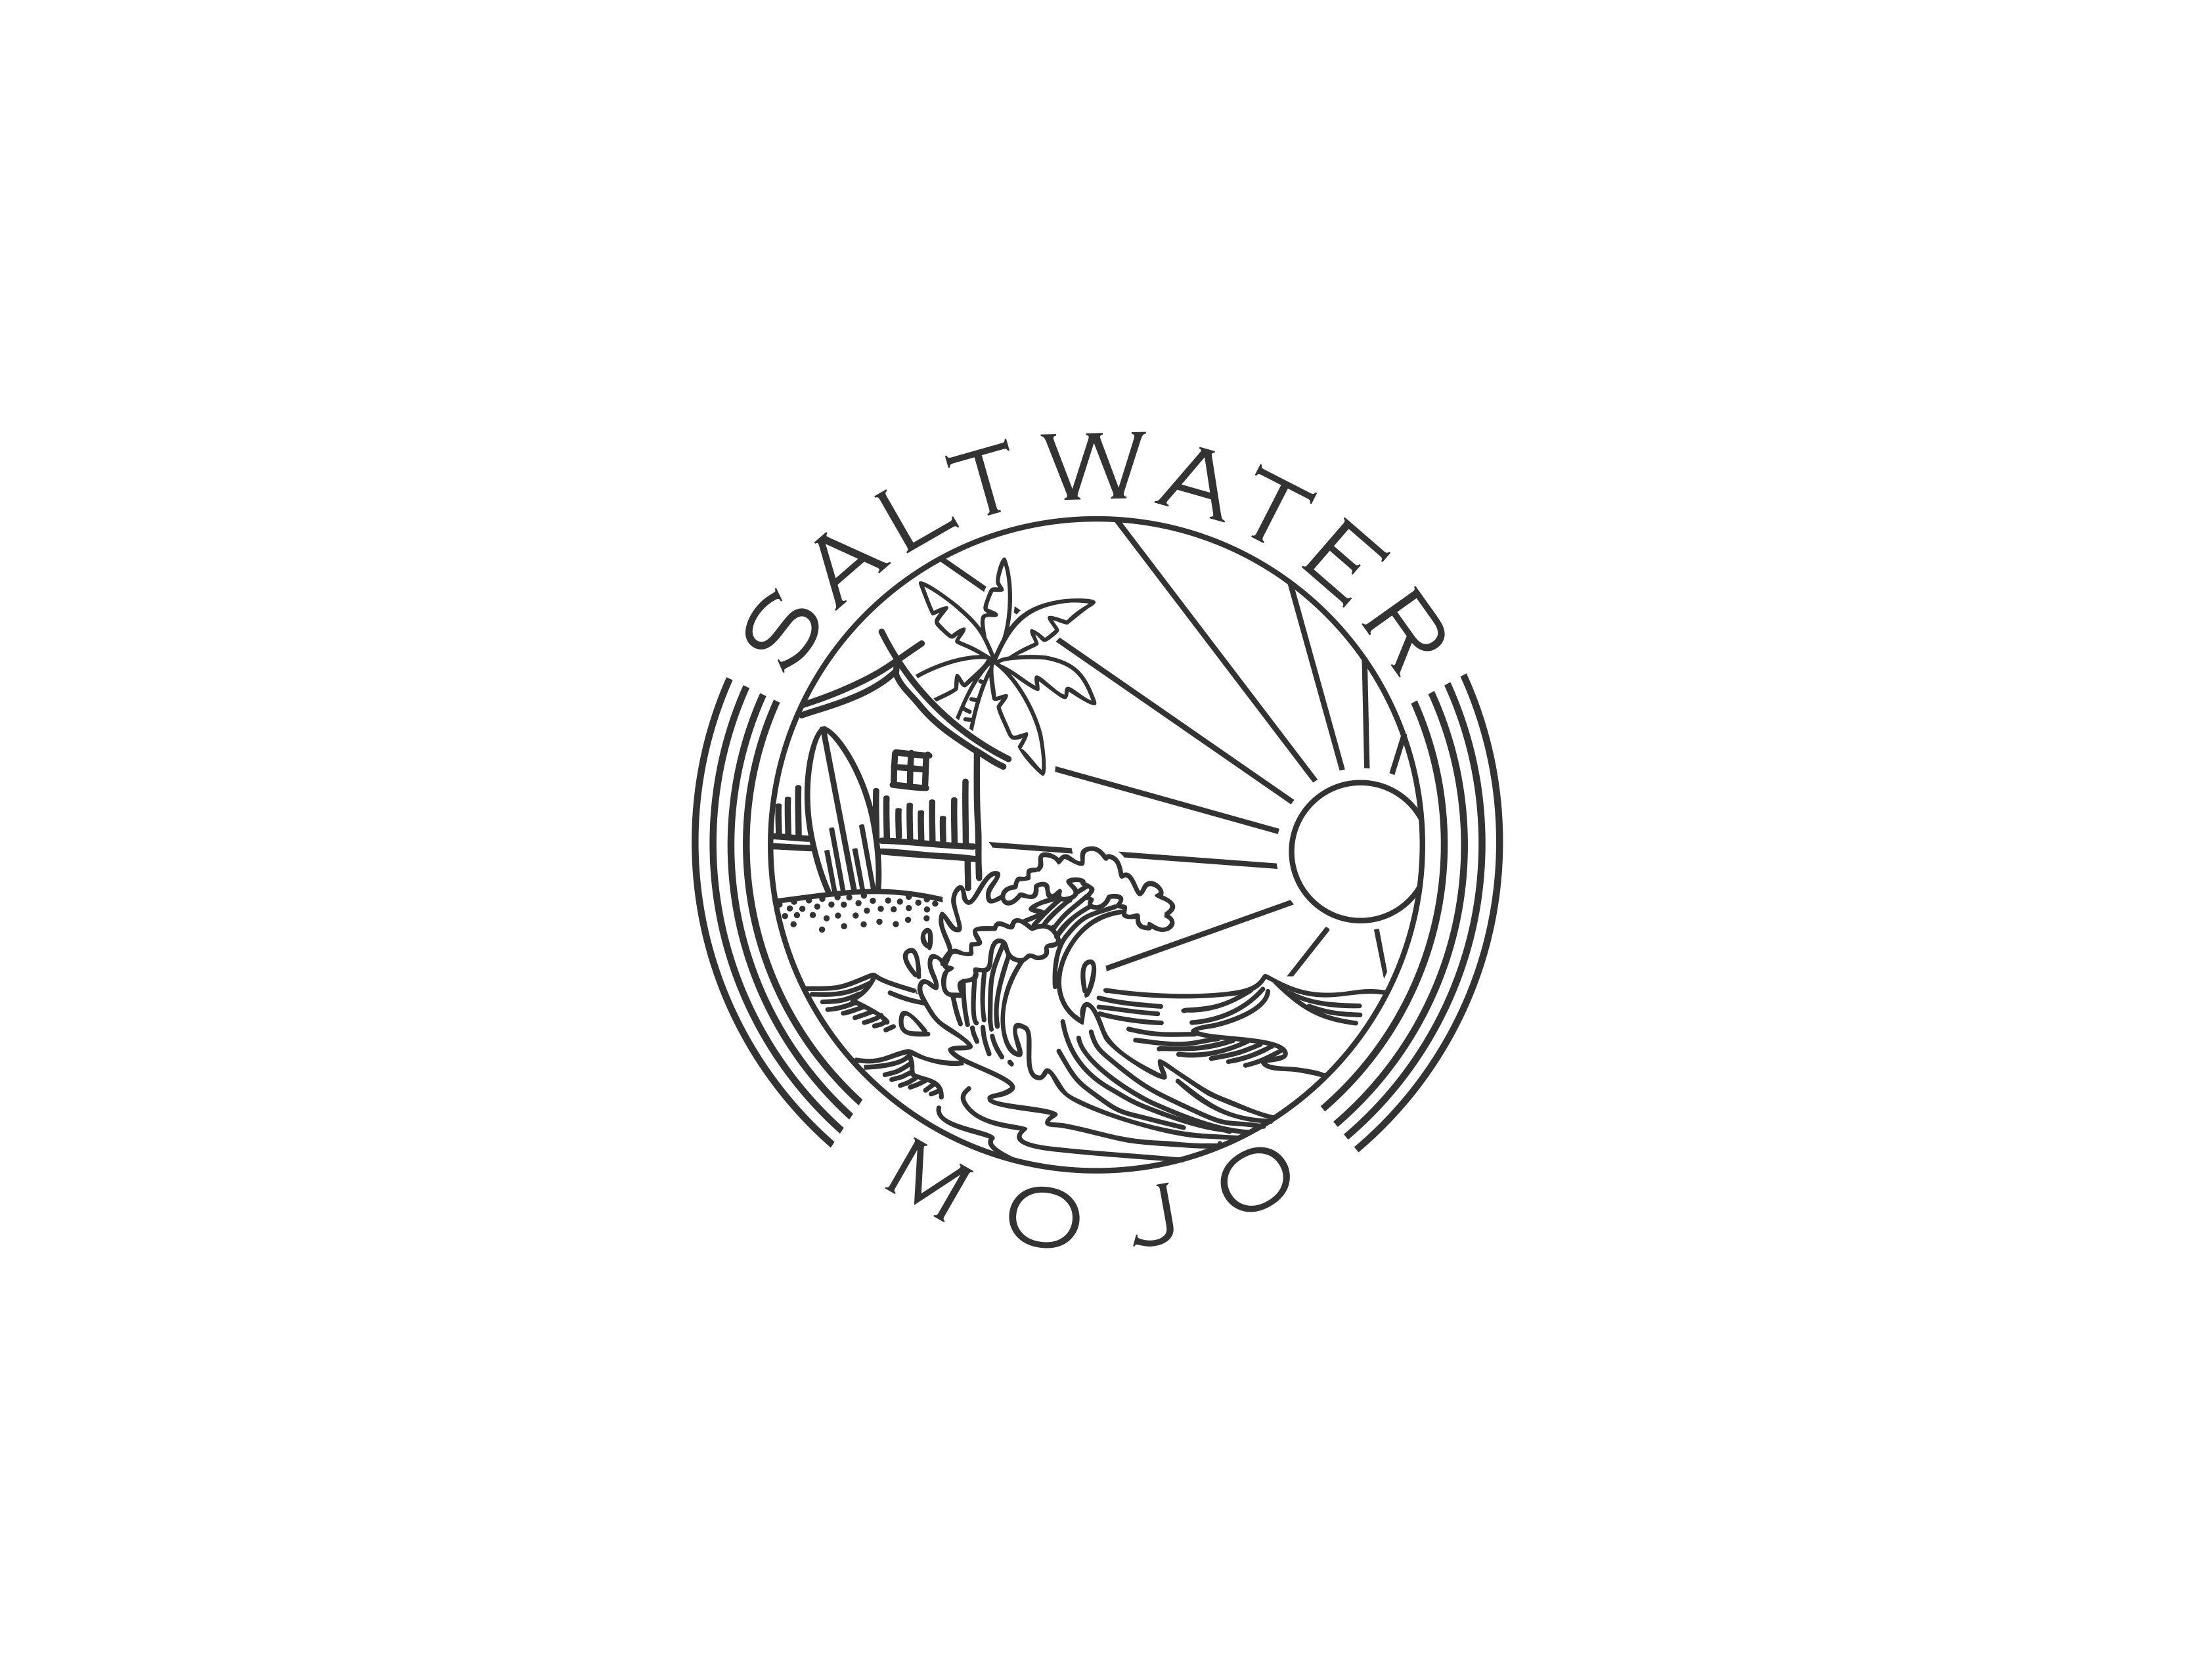 Design for sun & fun beach t-shirts and apparel (Company Logo)